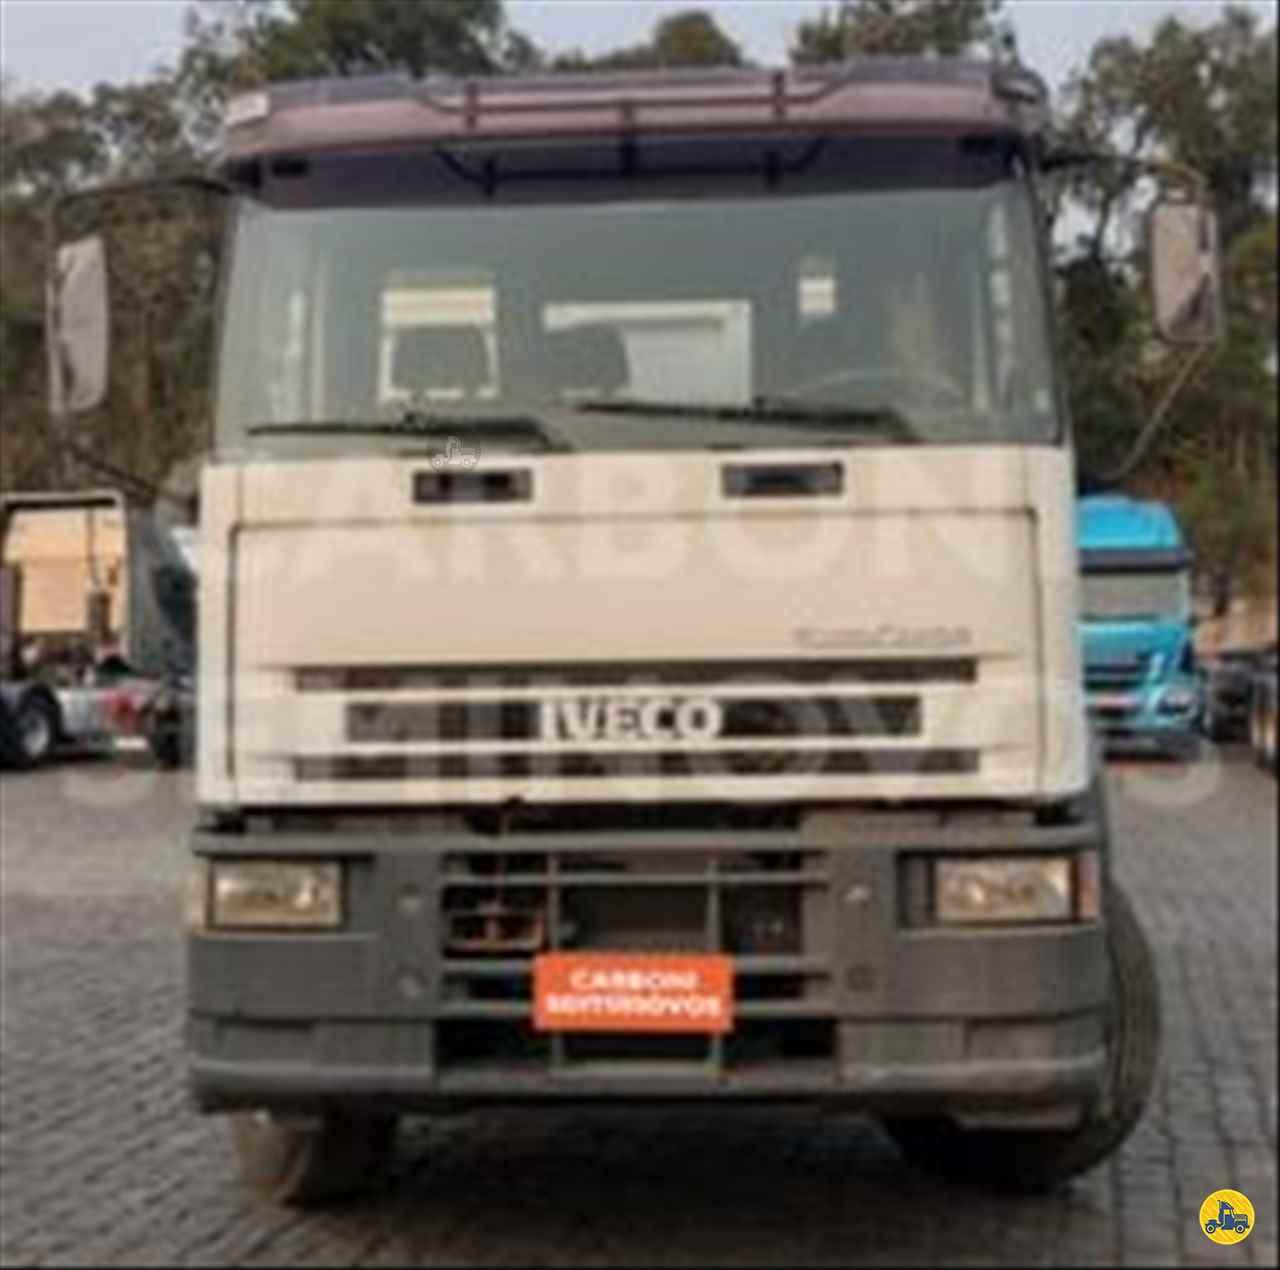 CAMINHAO IVECO EUROCARGO 160E21 Graneleiro Truck 6x2 Carboni Iveco VIDEIRA SANTA CATARINA SC